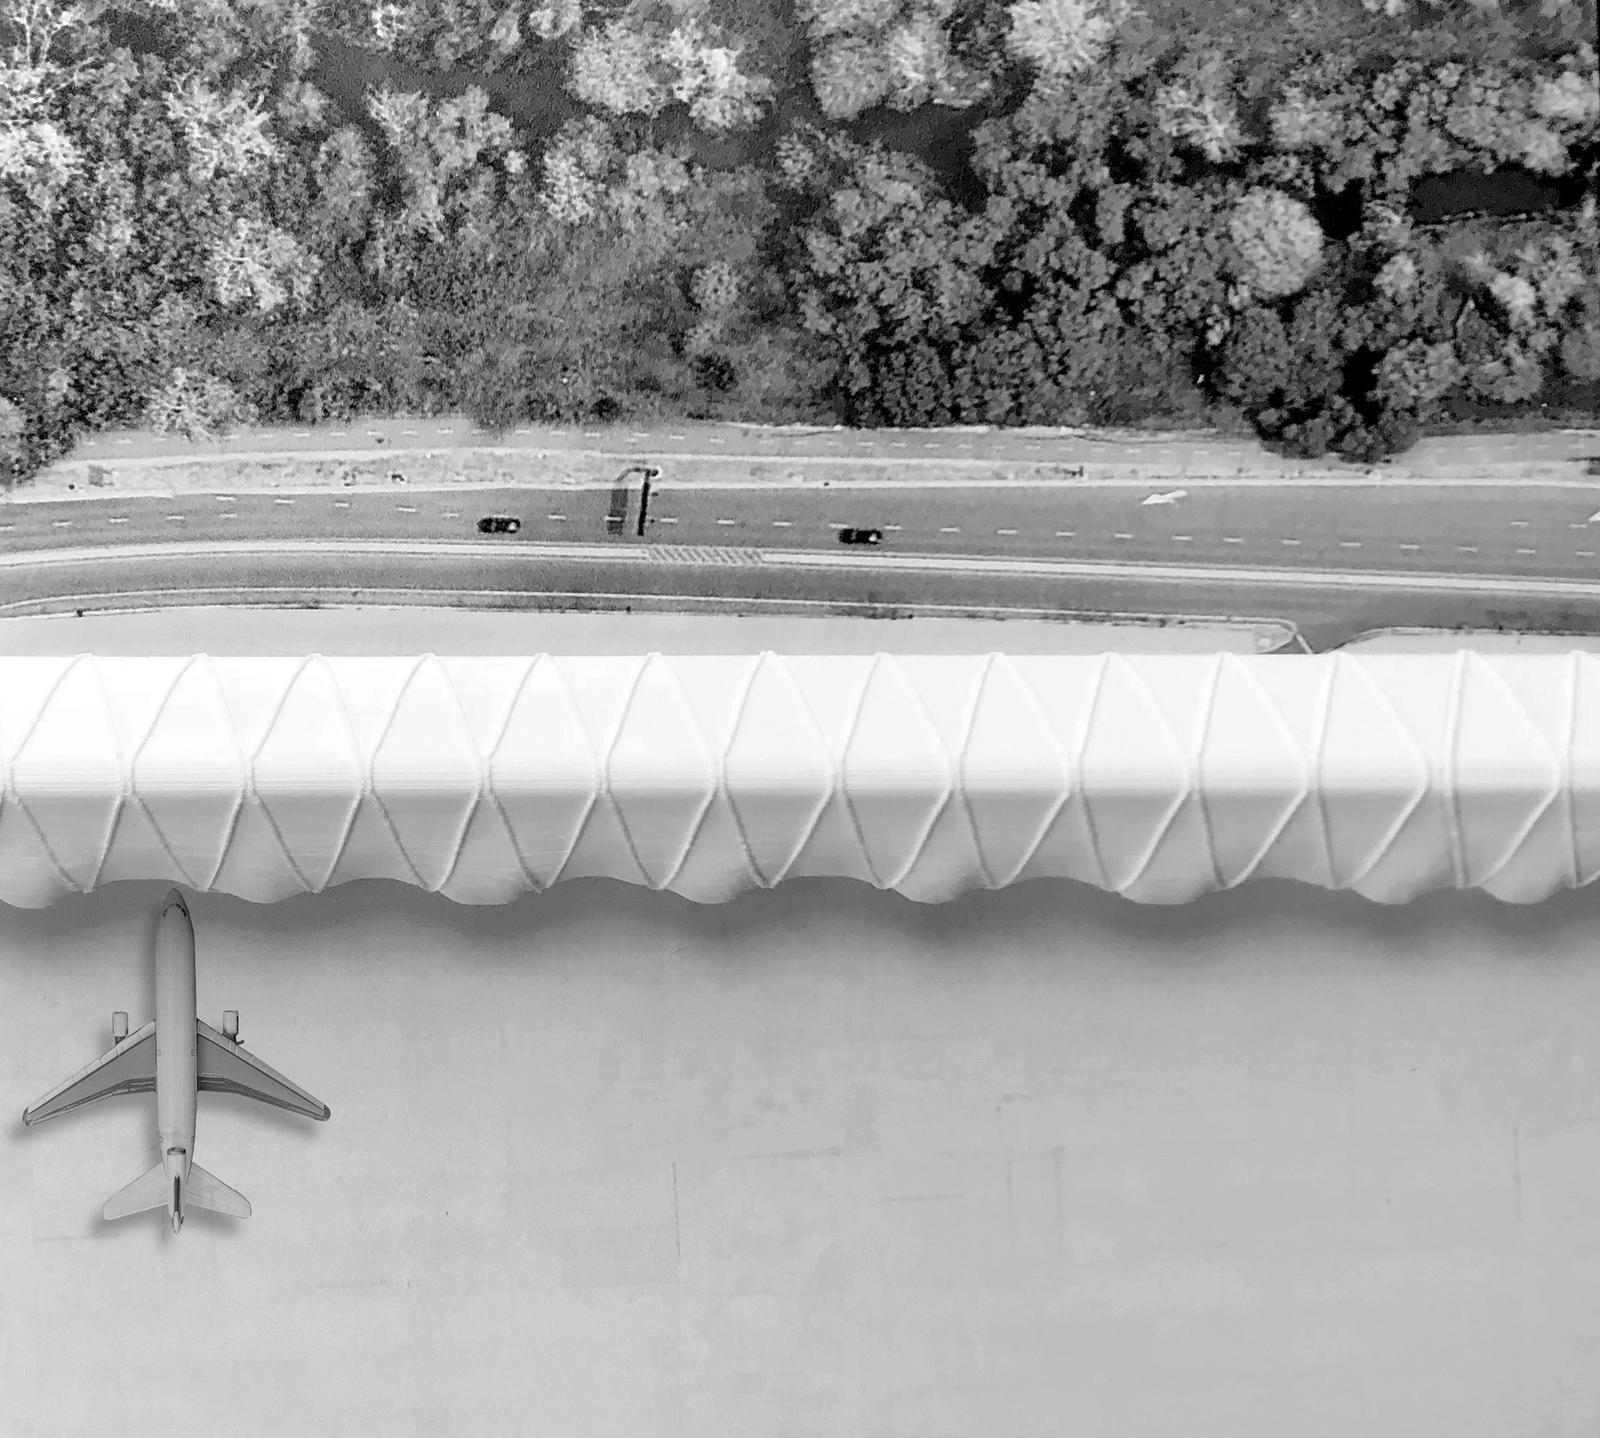 Dana Kaddouh Aviopolis - Model View Terminal Areas